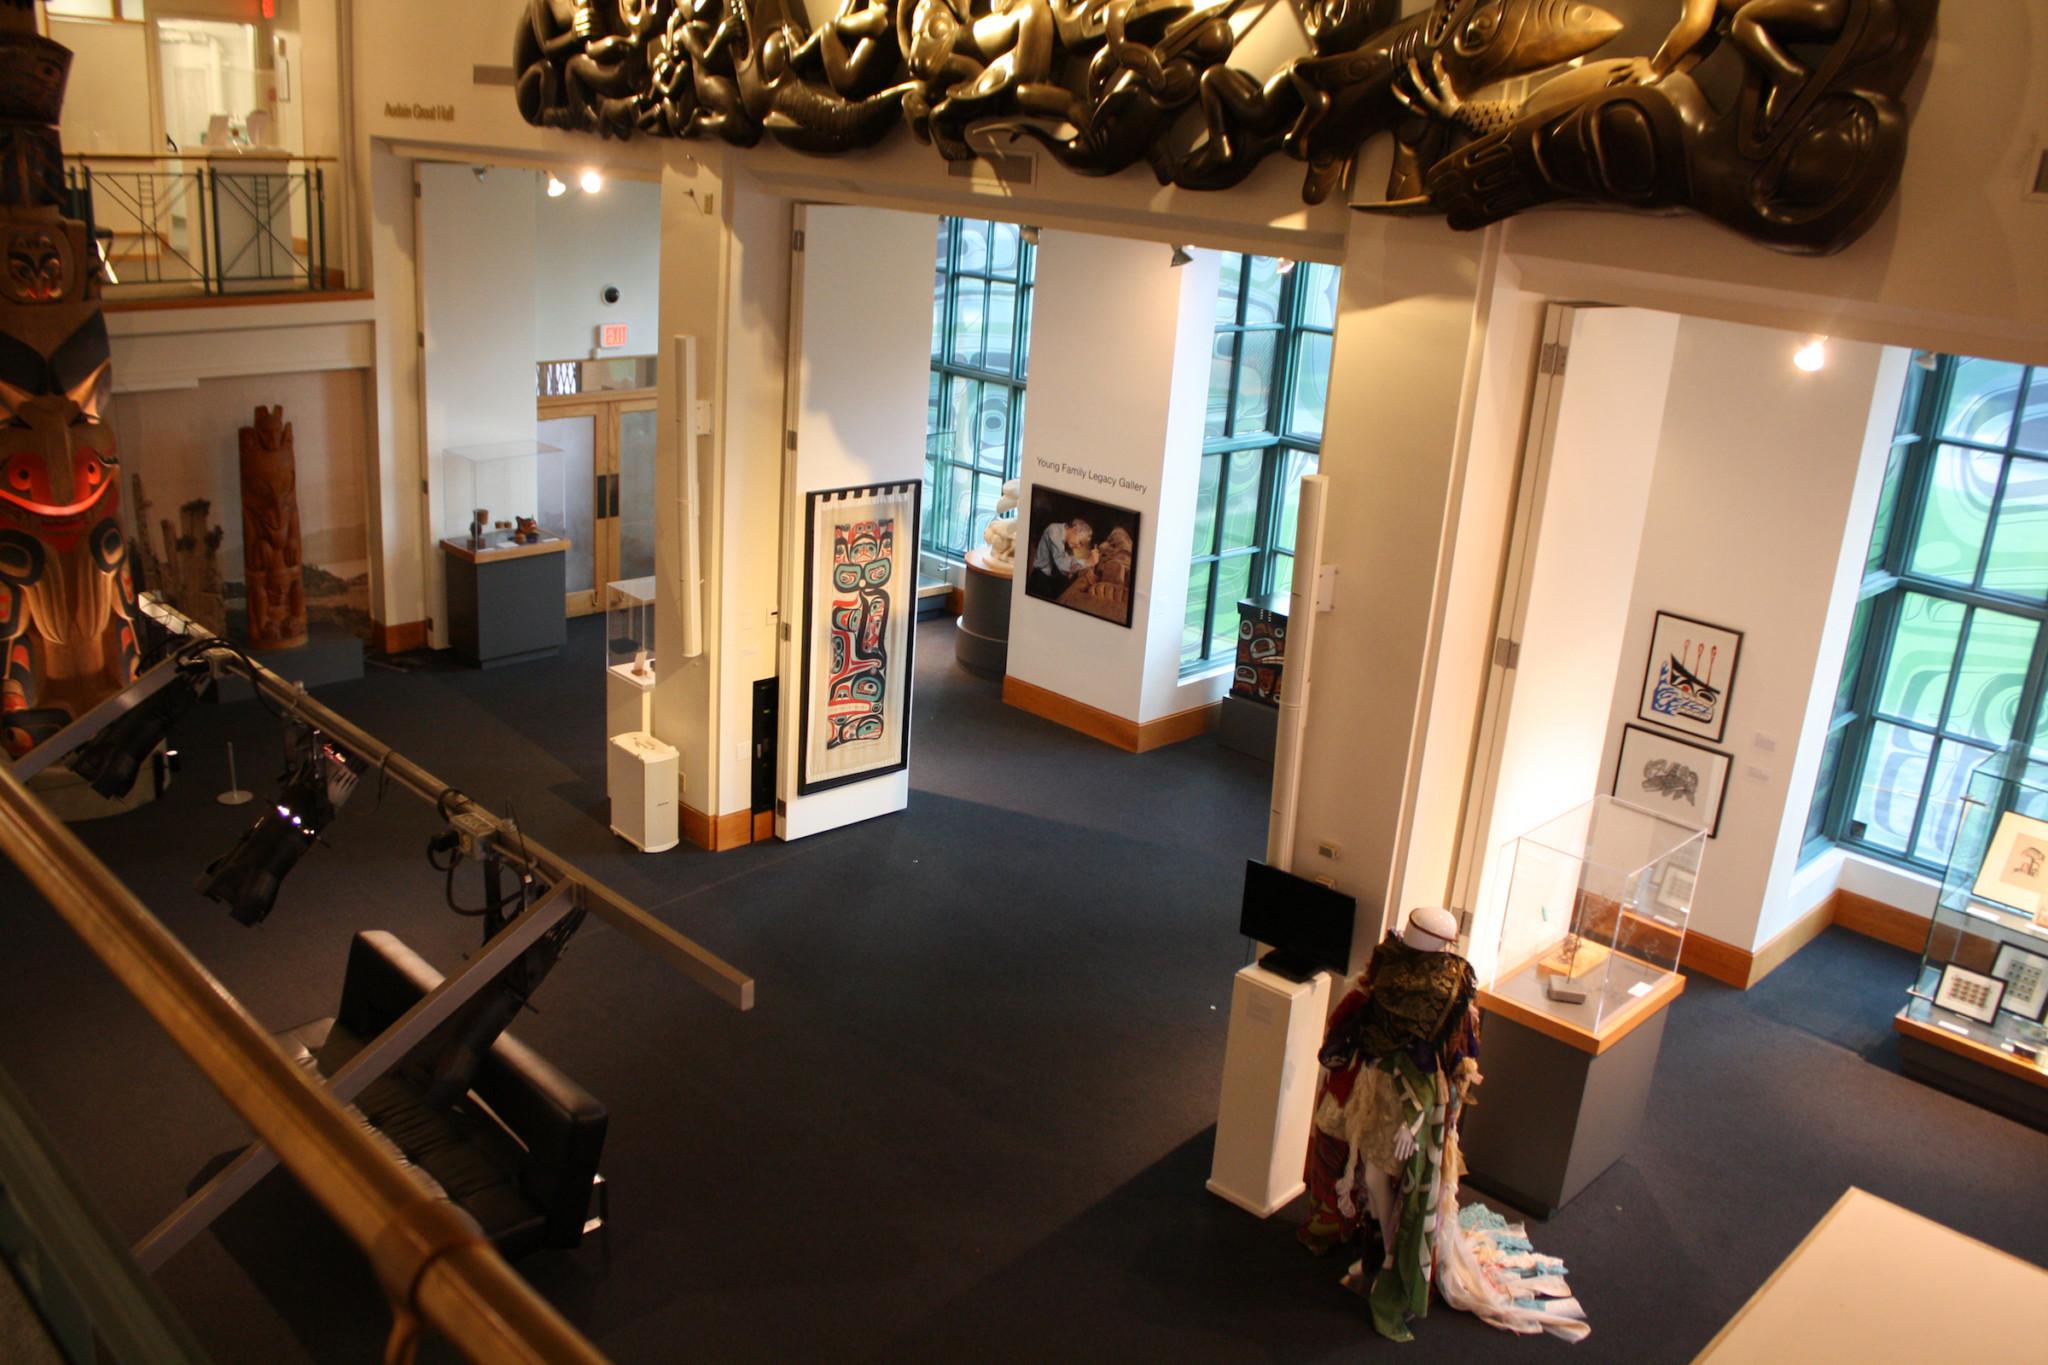 Bill Reid Gallery Marks 10th Anniversary with $1.5 Million Renovation